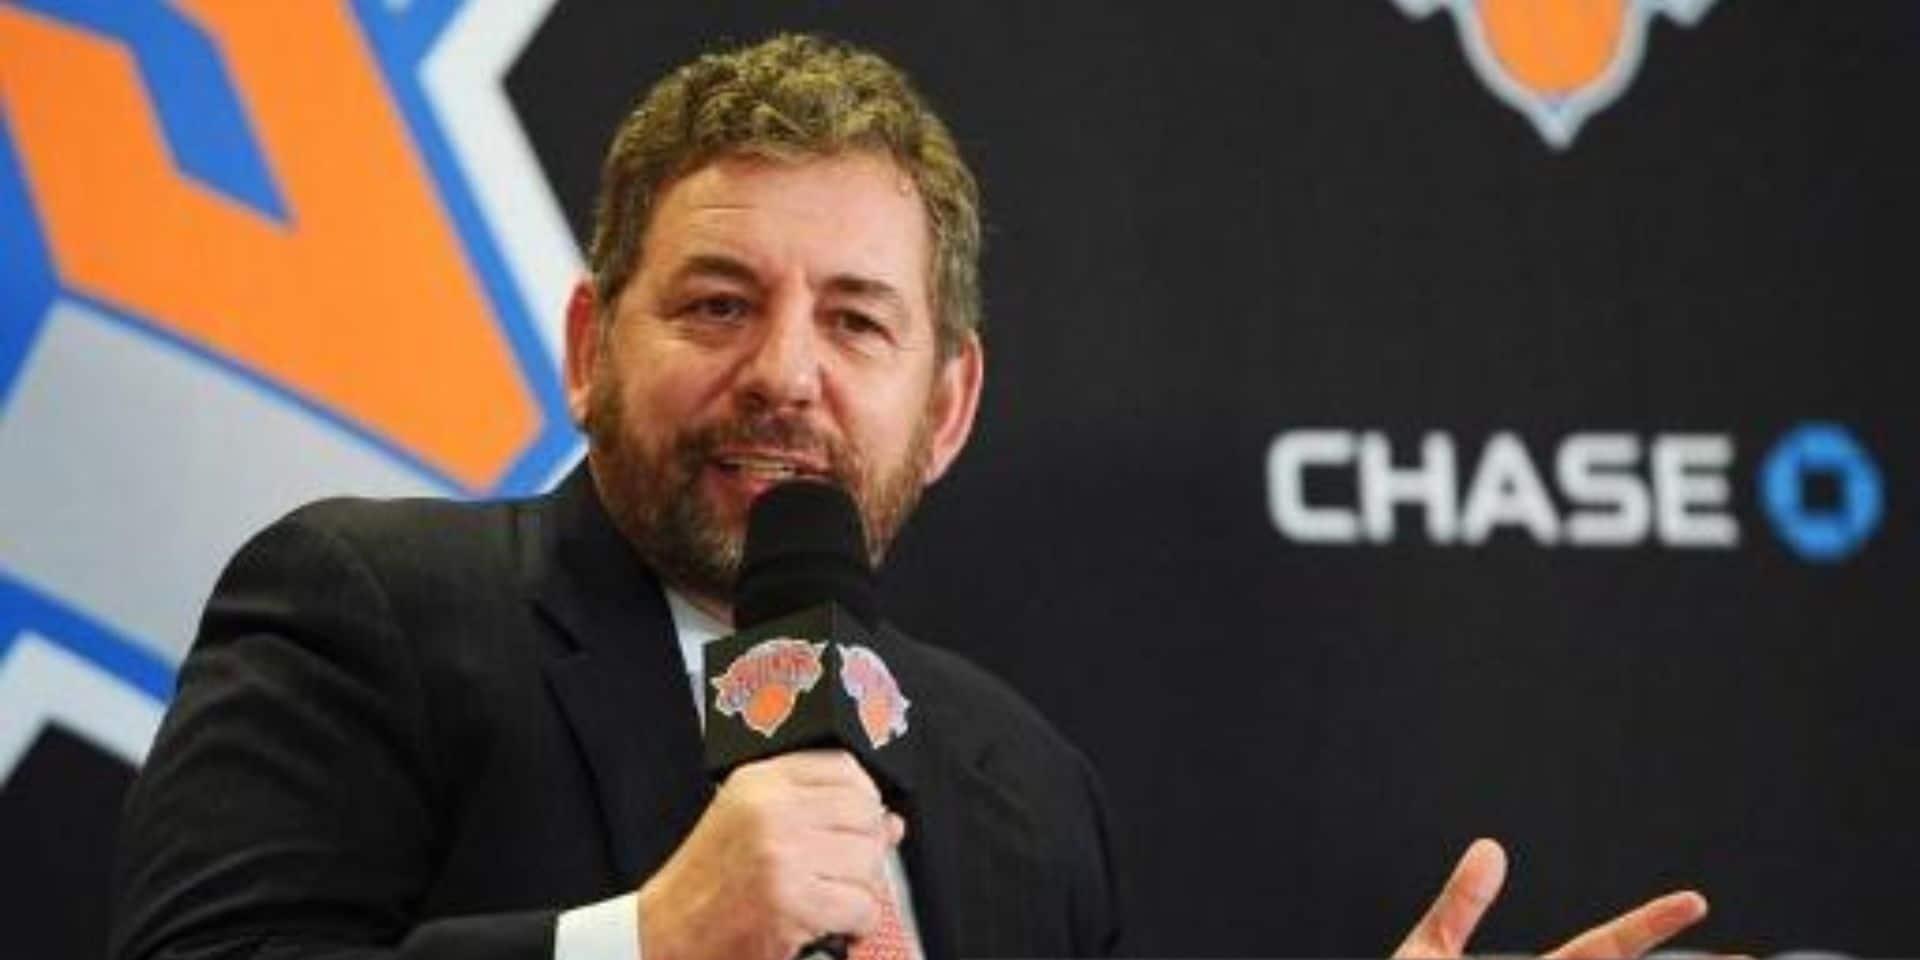 Le patron des New York Knicks positif au coronavirus